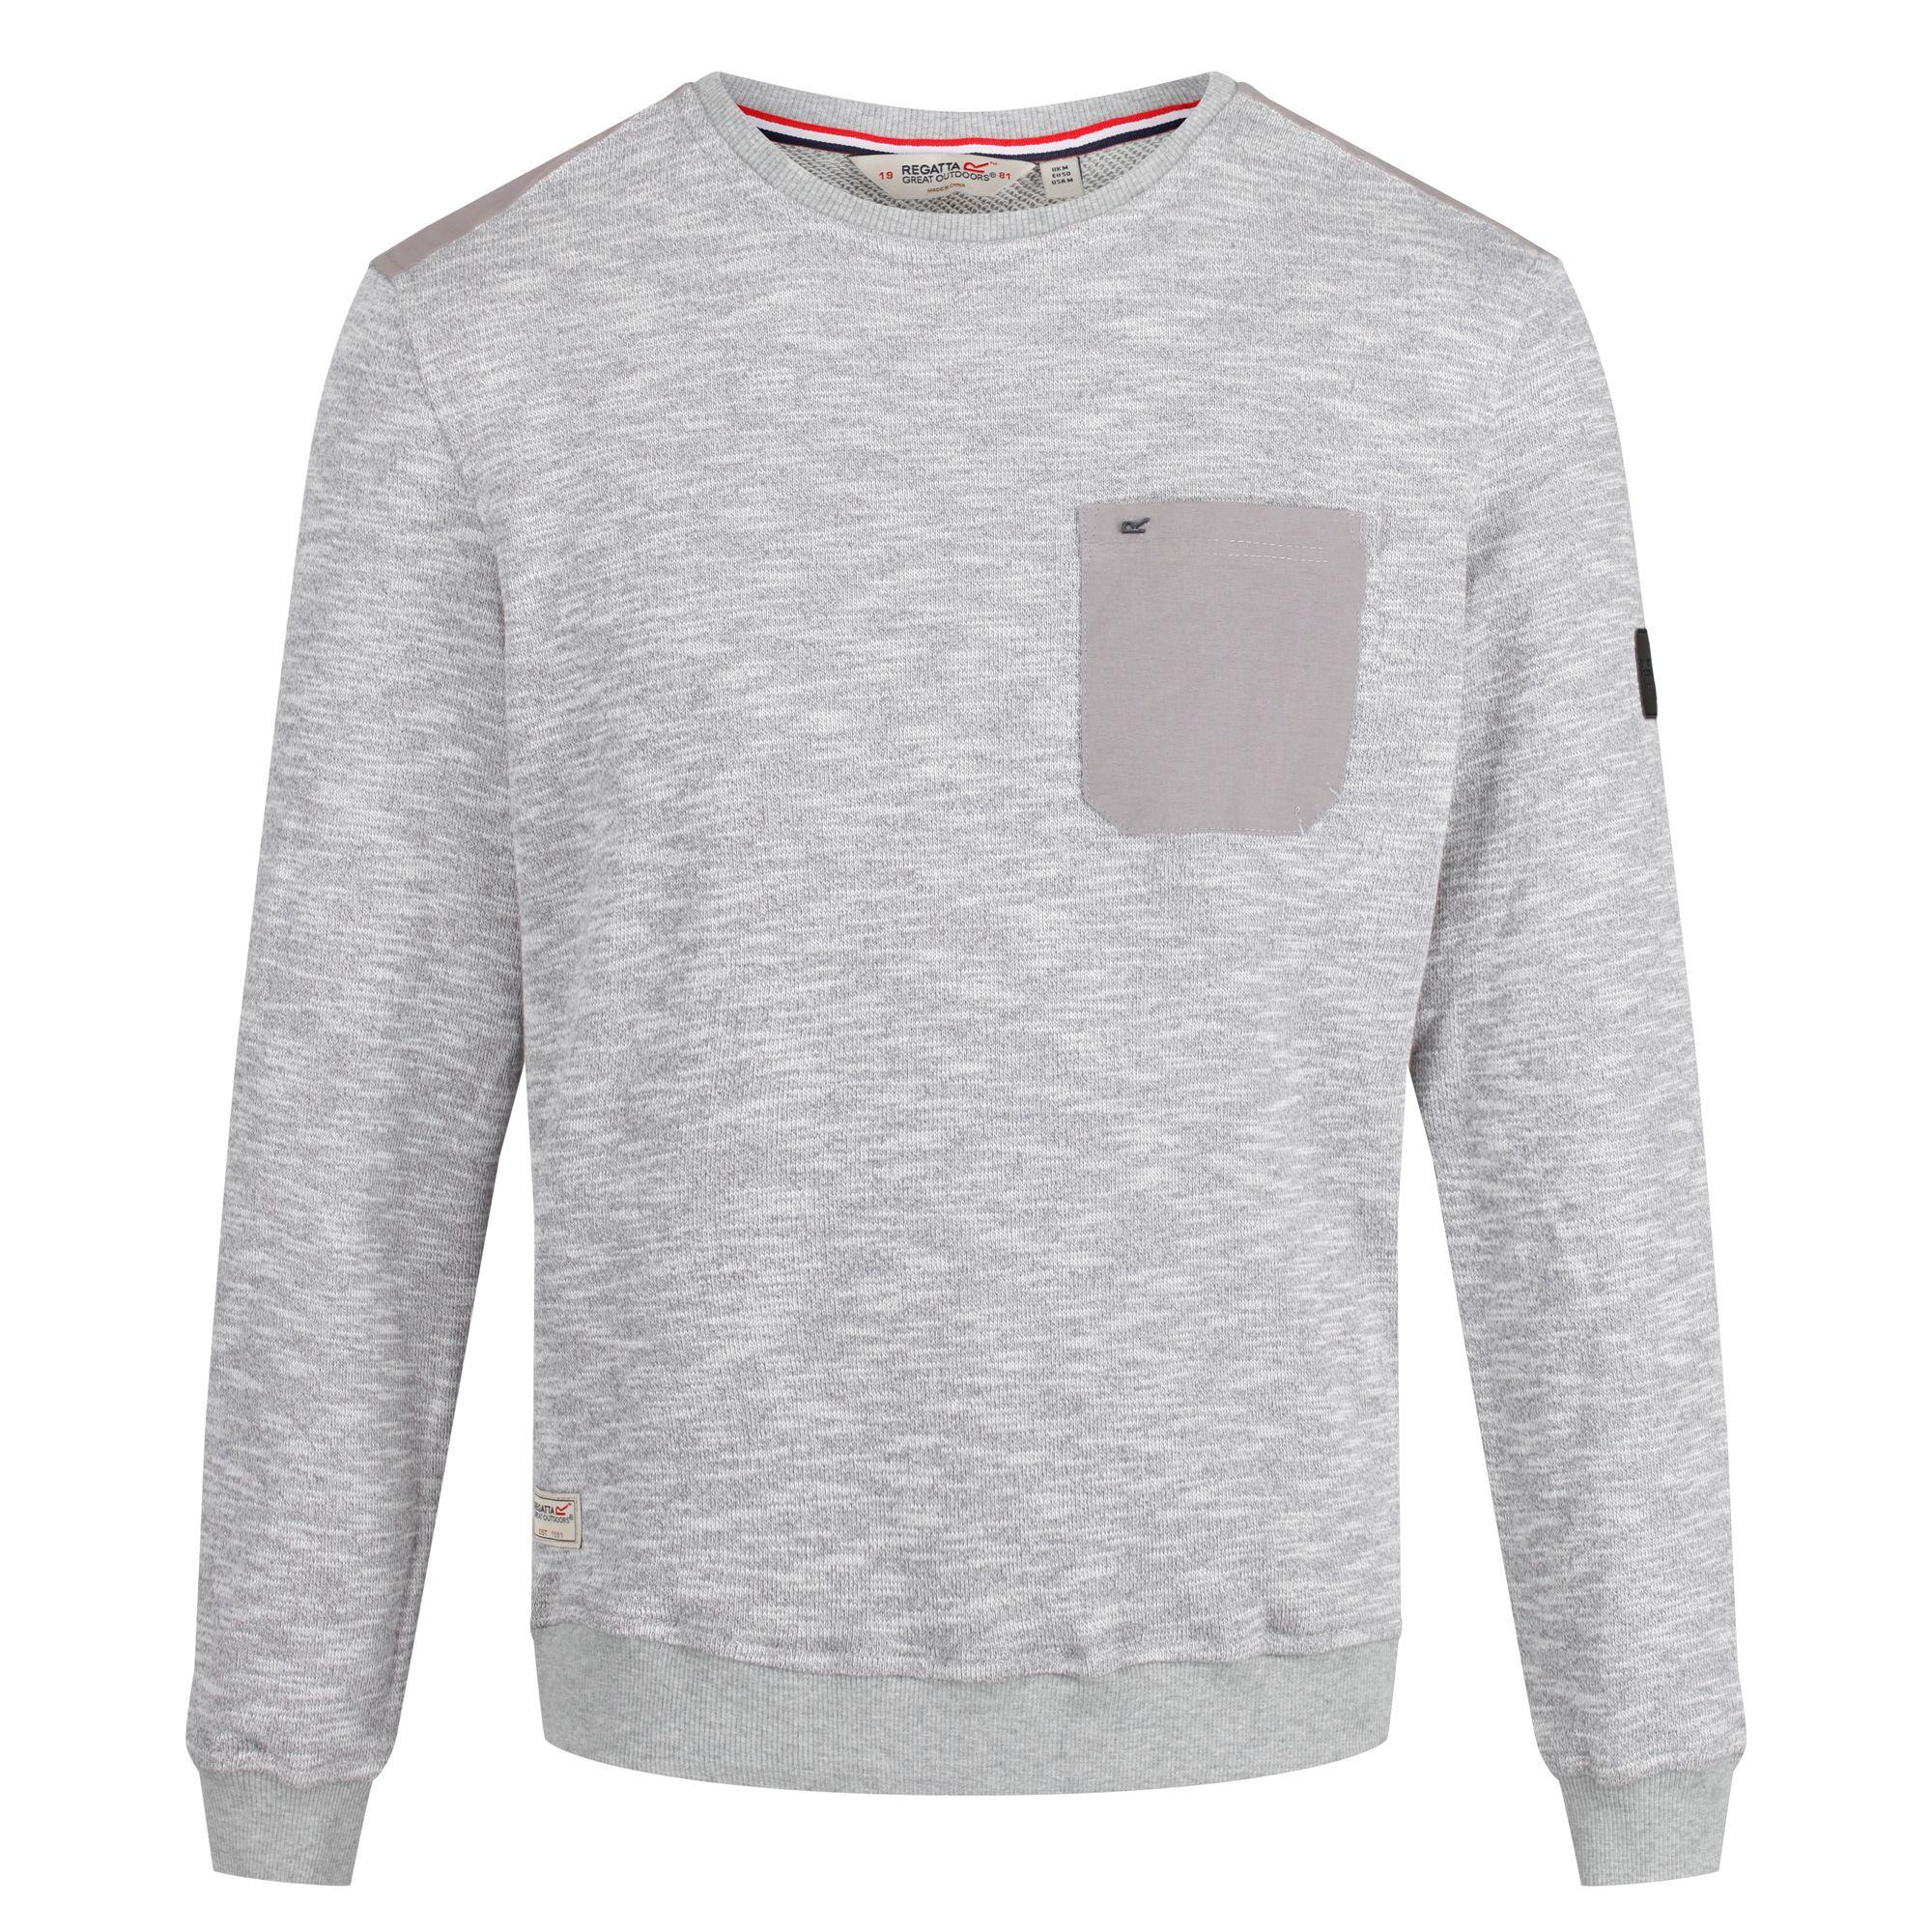 Regatta Mens Sandor Chest Pocket Sweatshirt